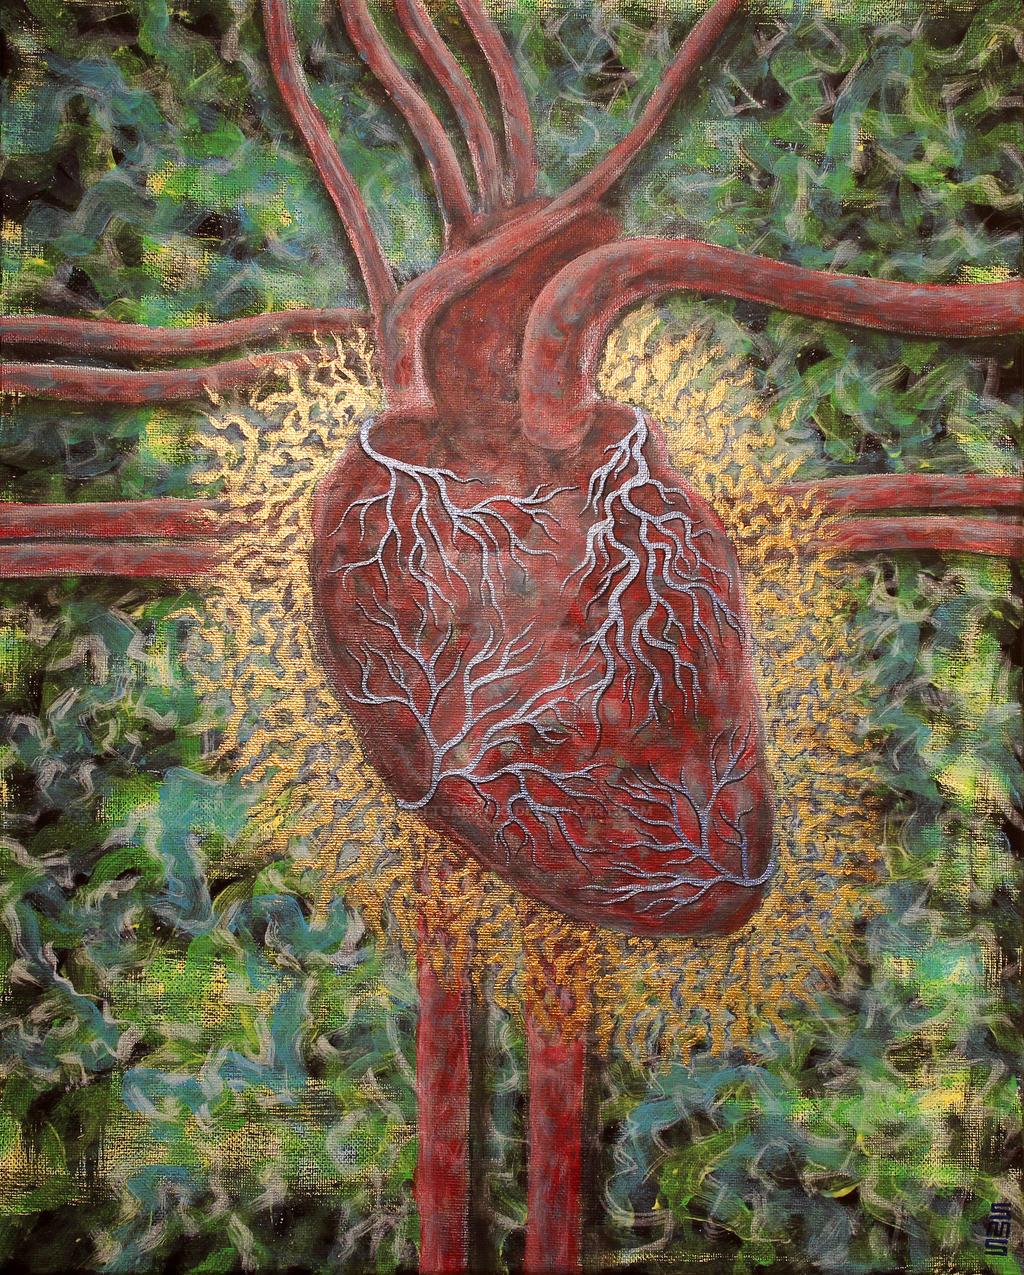 Radiant Heart by scottsampaio